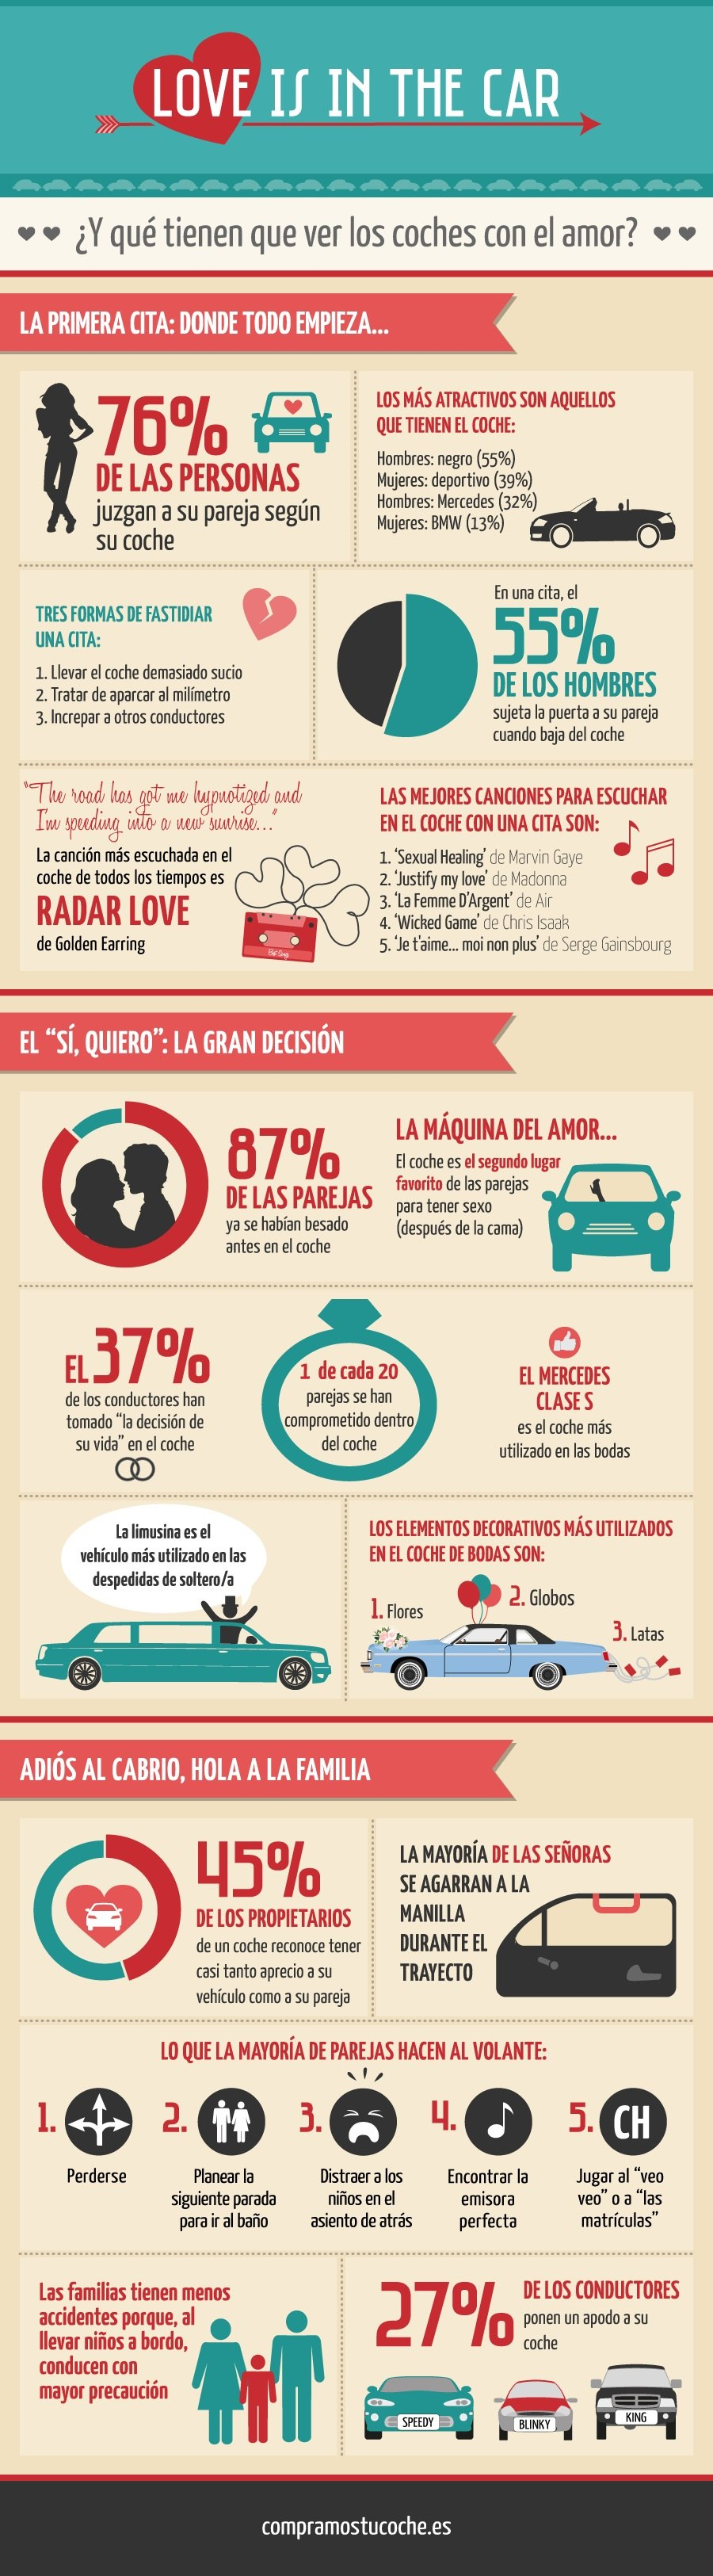 infographic_valentinesday_es